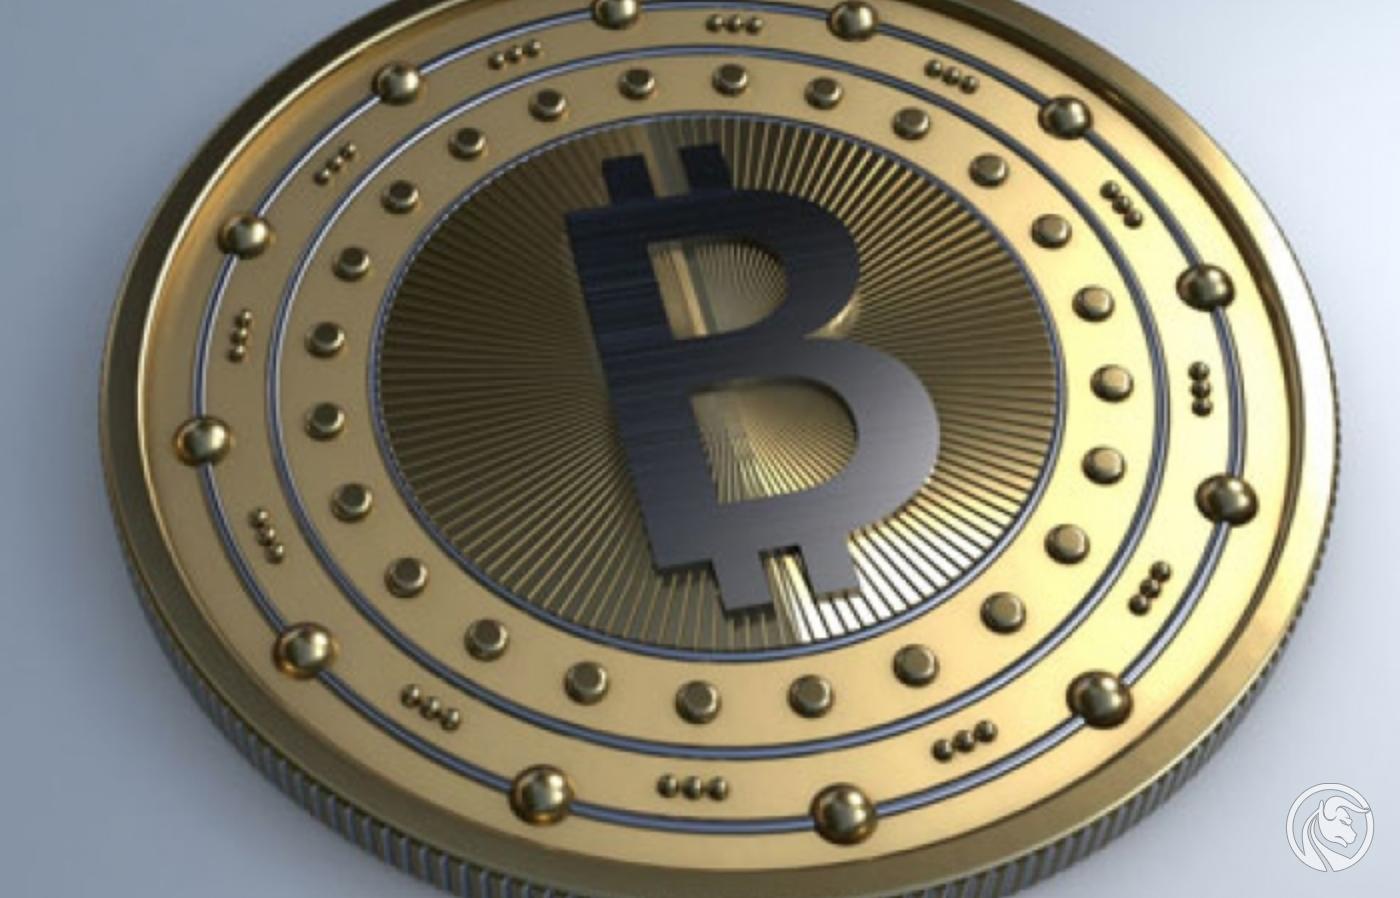 Bitcoin – czy końcówka roku może być podobna do tej z 2017 r.? – Webinar z 22.11.2018 [VIDEO]